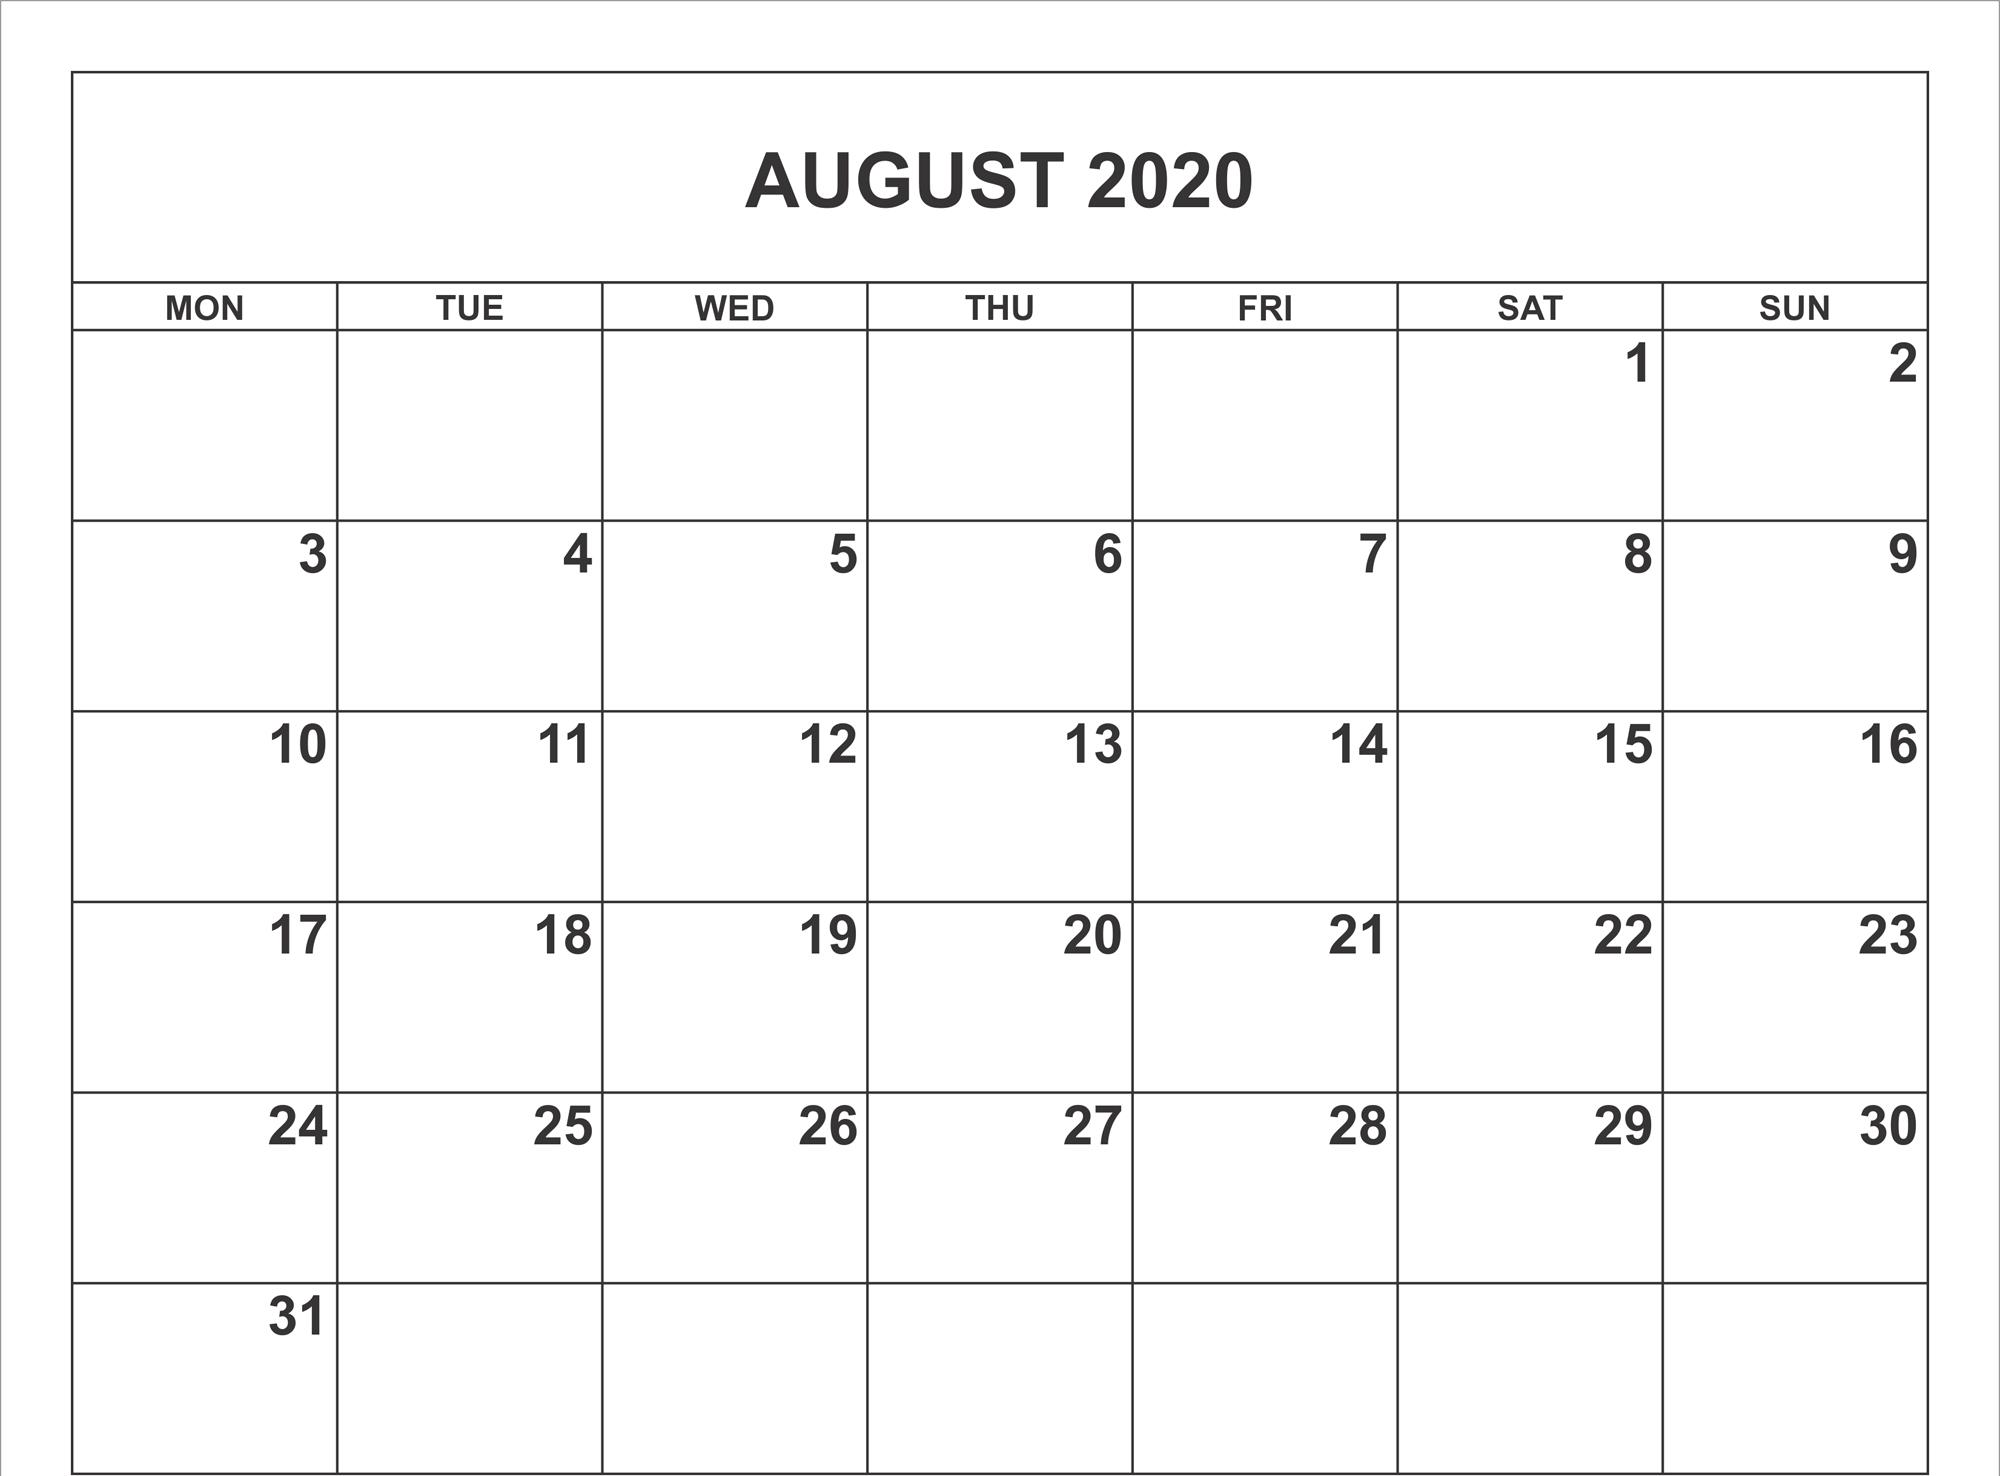 August 2020 Calendar Pdf, Word, Excel Template with Kid Freiendly August 2020 Calendars